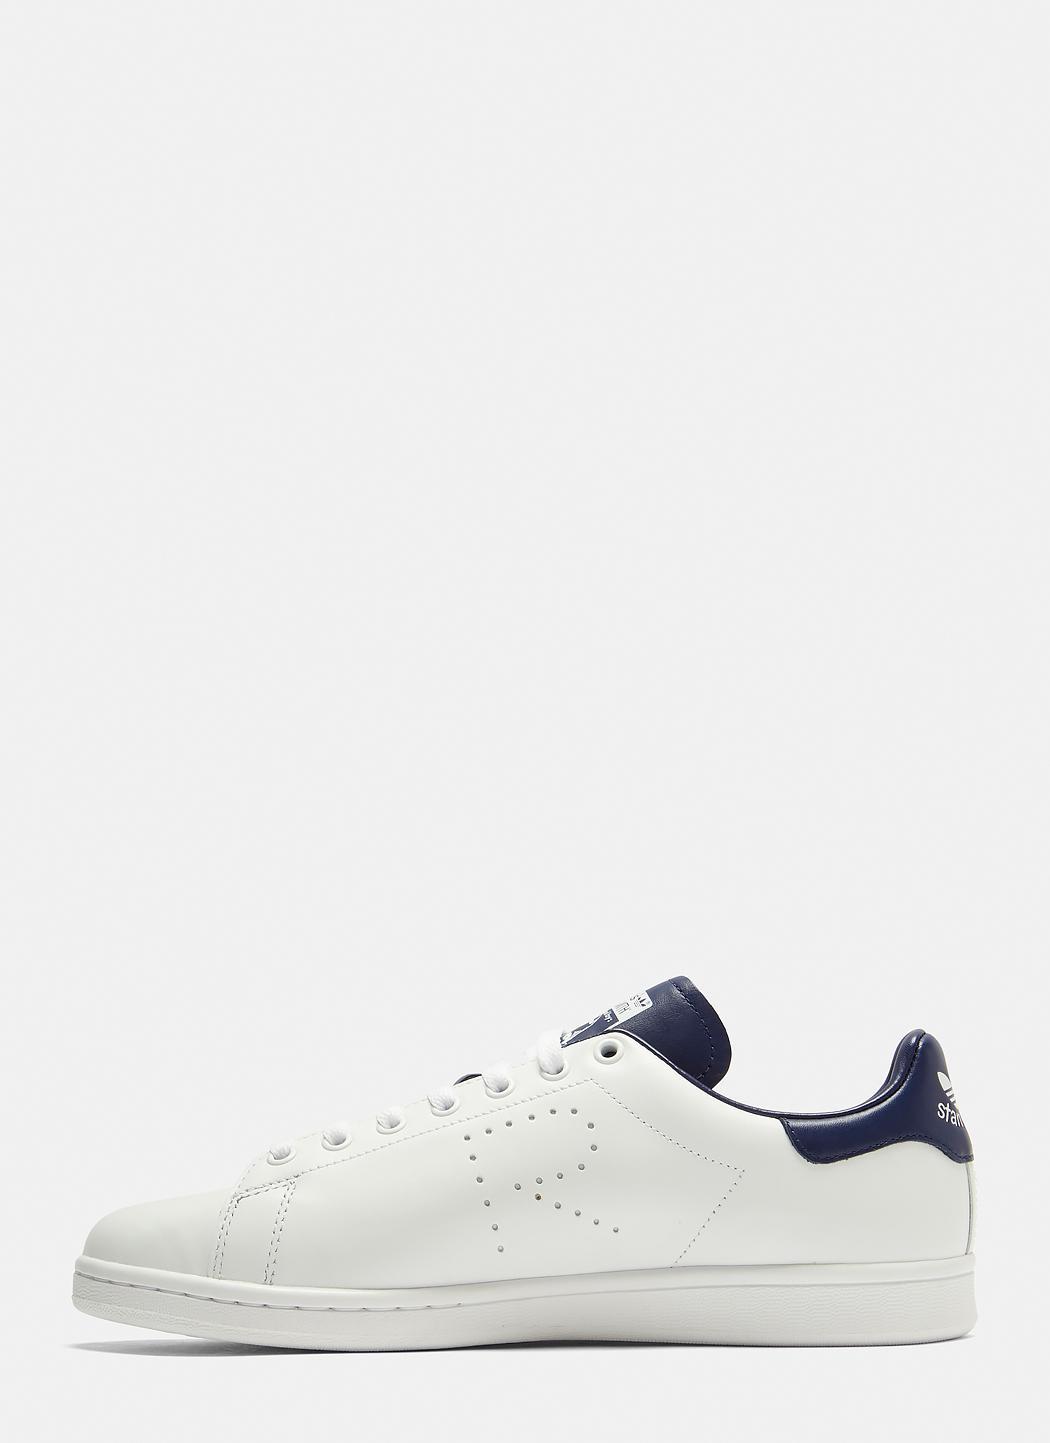 Lyst adidas da raf simons stan smith scarpe in bianco / marina